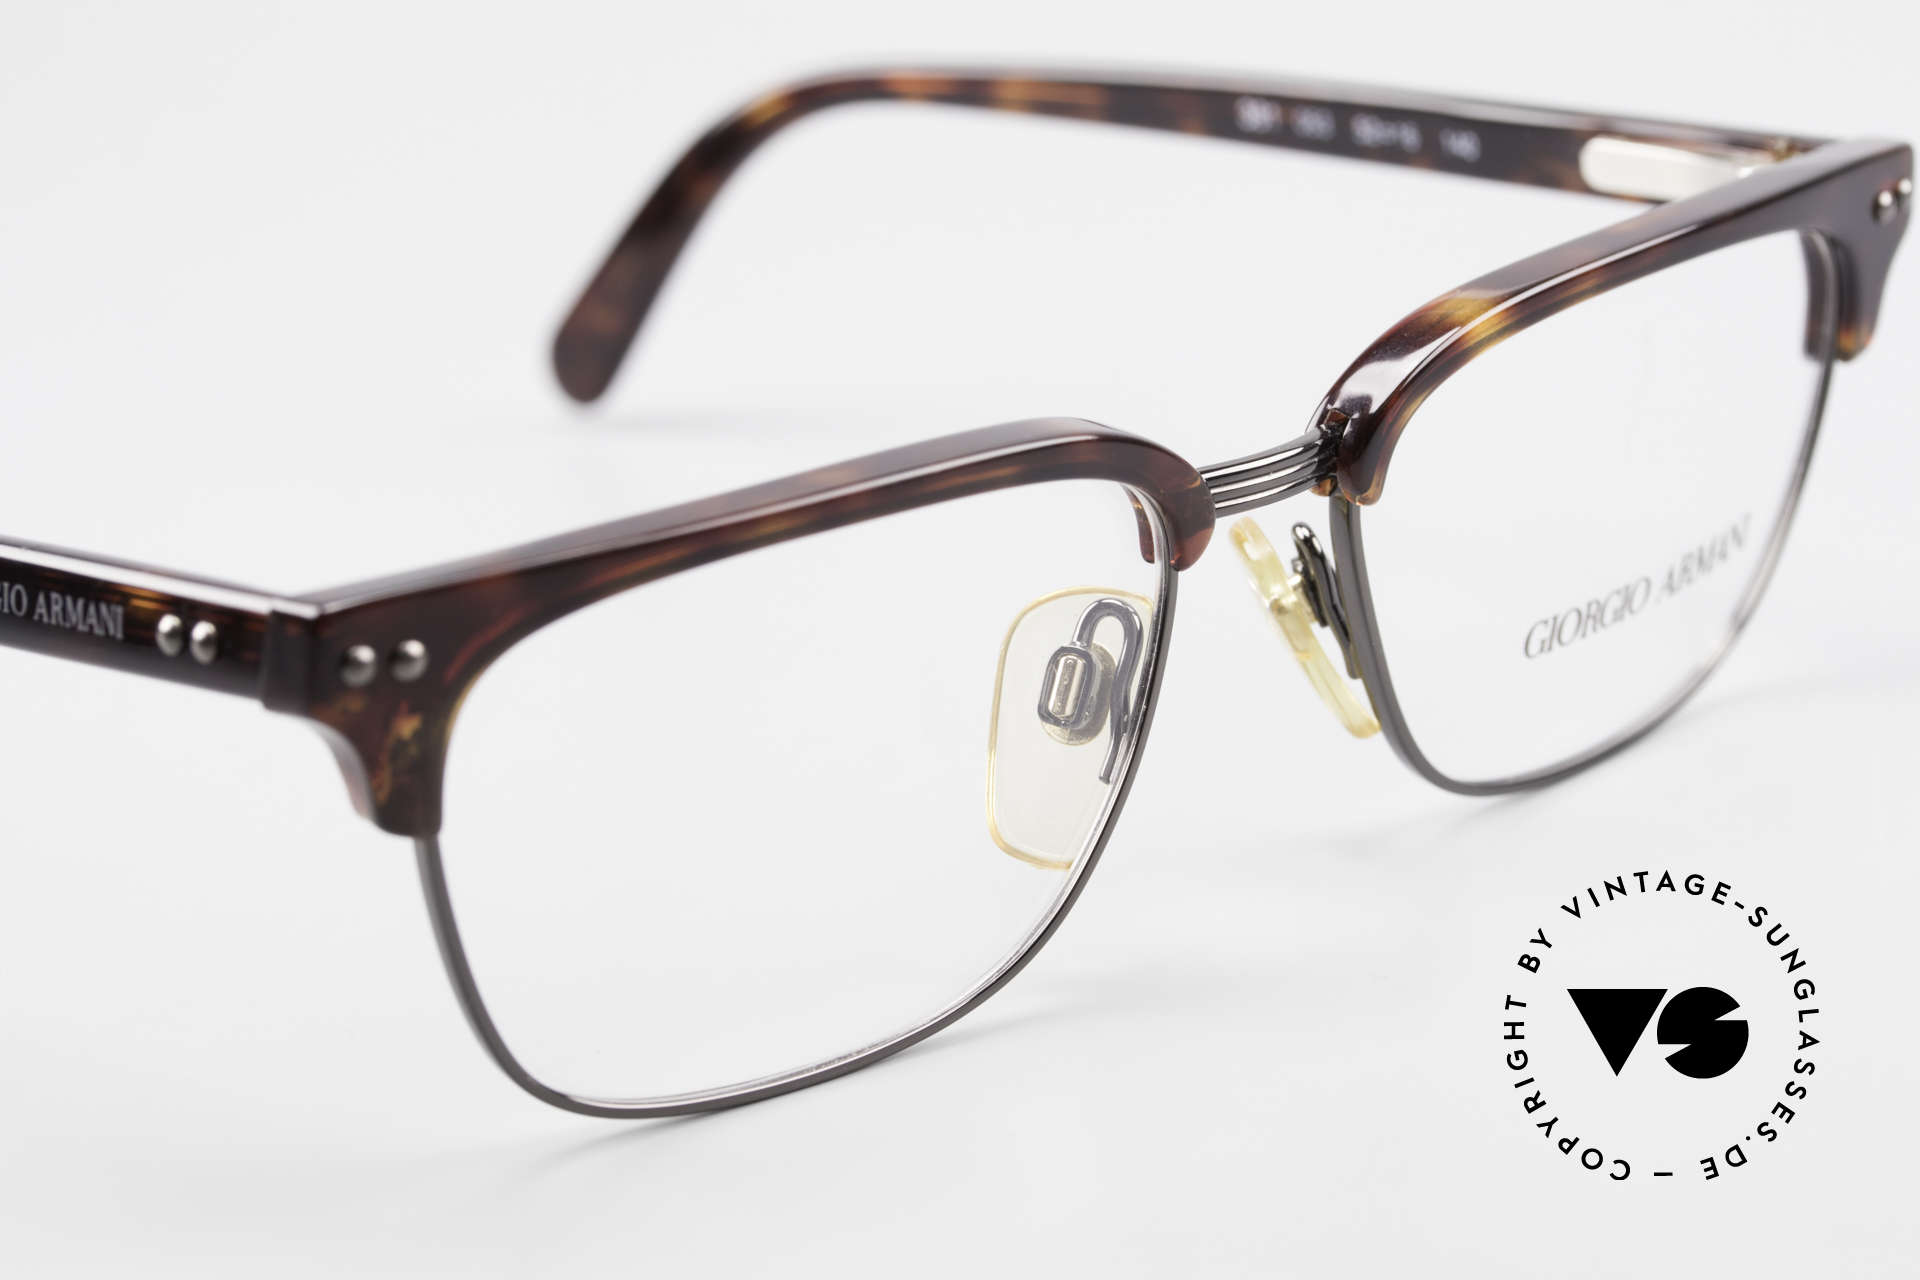 Giorgio Armani 381 Vintage Specs Clubmaster Style, NO retro glasses, but a unique 25 years old ORIGINAL, Made for Men